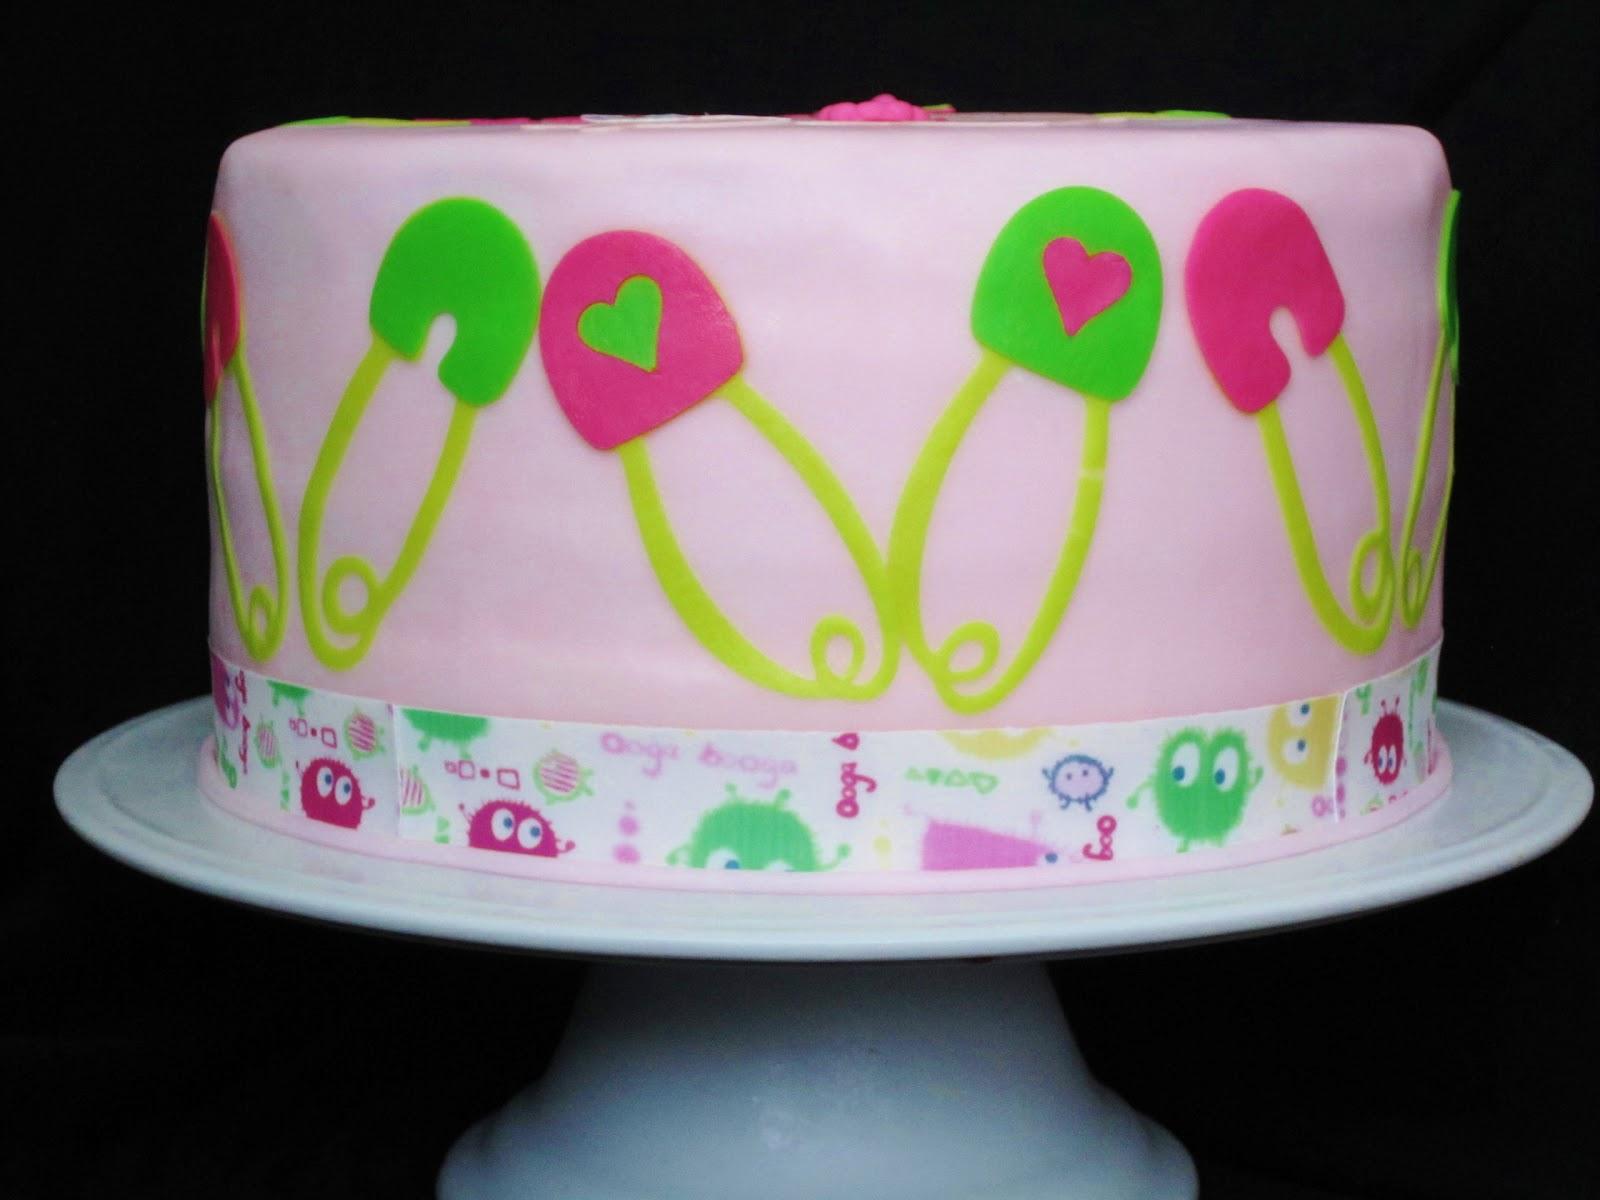 I Wish That I Had Jessie s Cakes